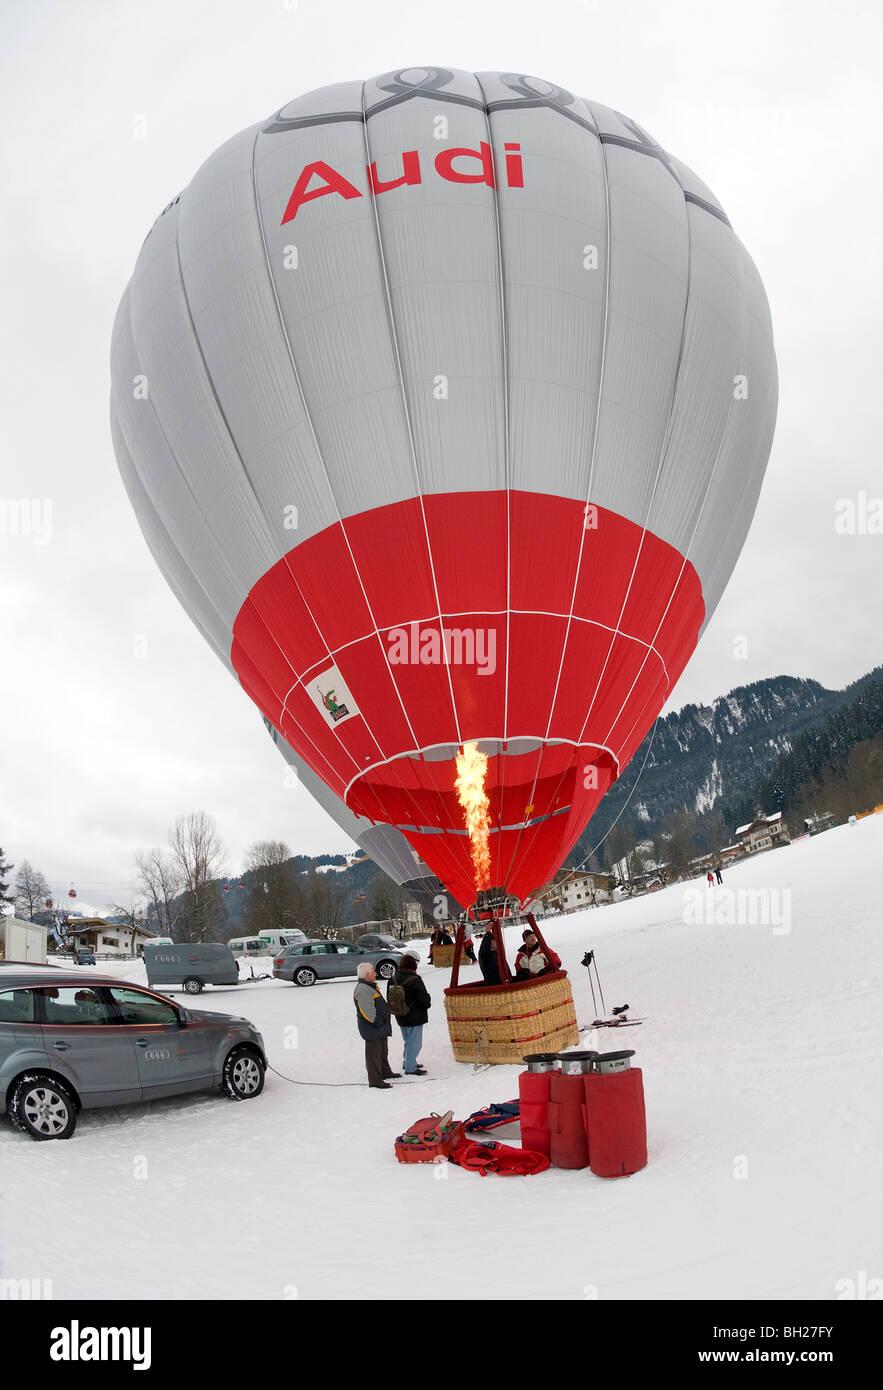 audi sponsored hot air balloon, kitzbuhel, austria - Stock Image